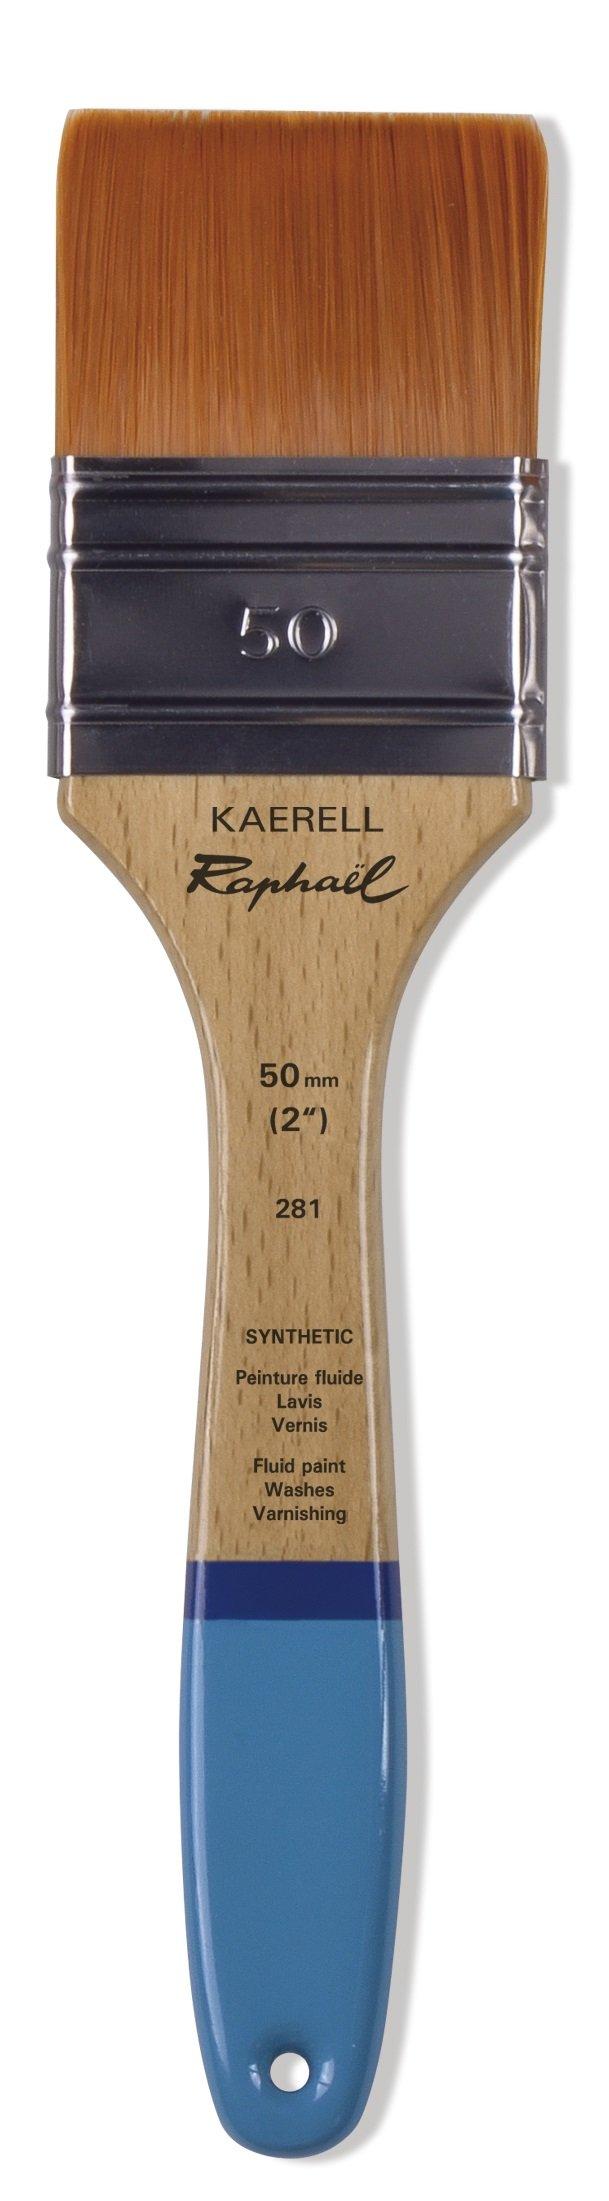 Raphael Flat Kaerell Varnish Brush 50 by Raphael